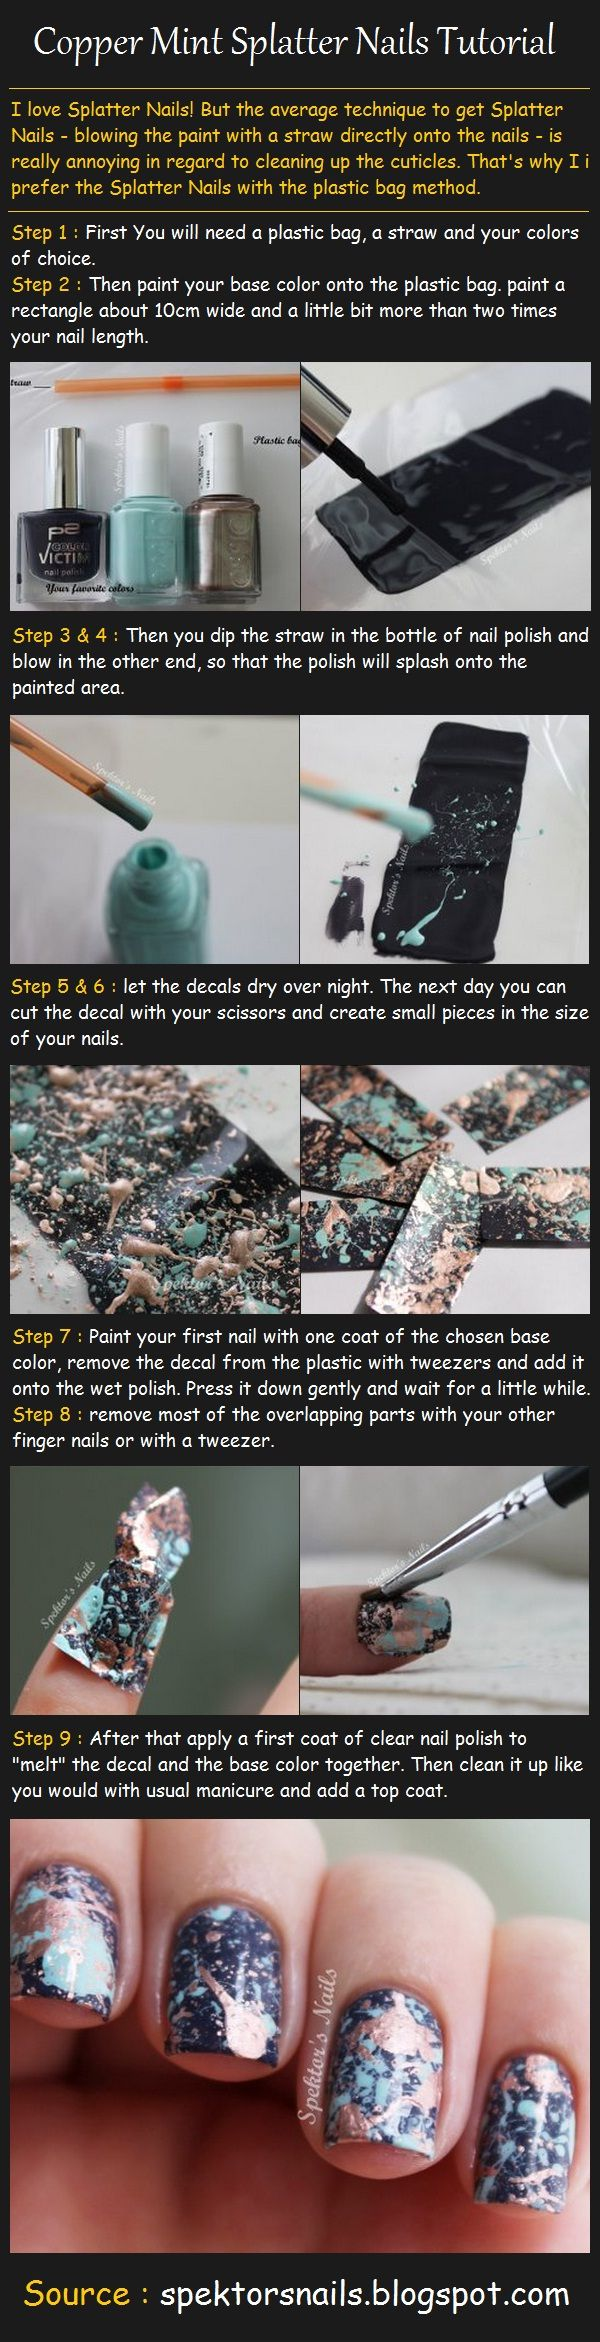 Copper Mint Splatter Nails Tutorial